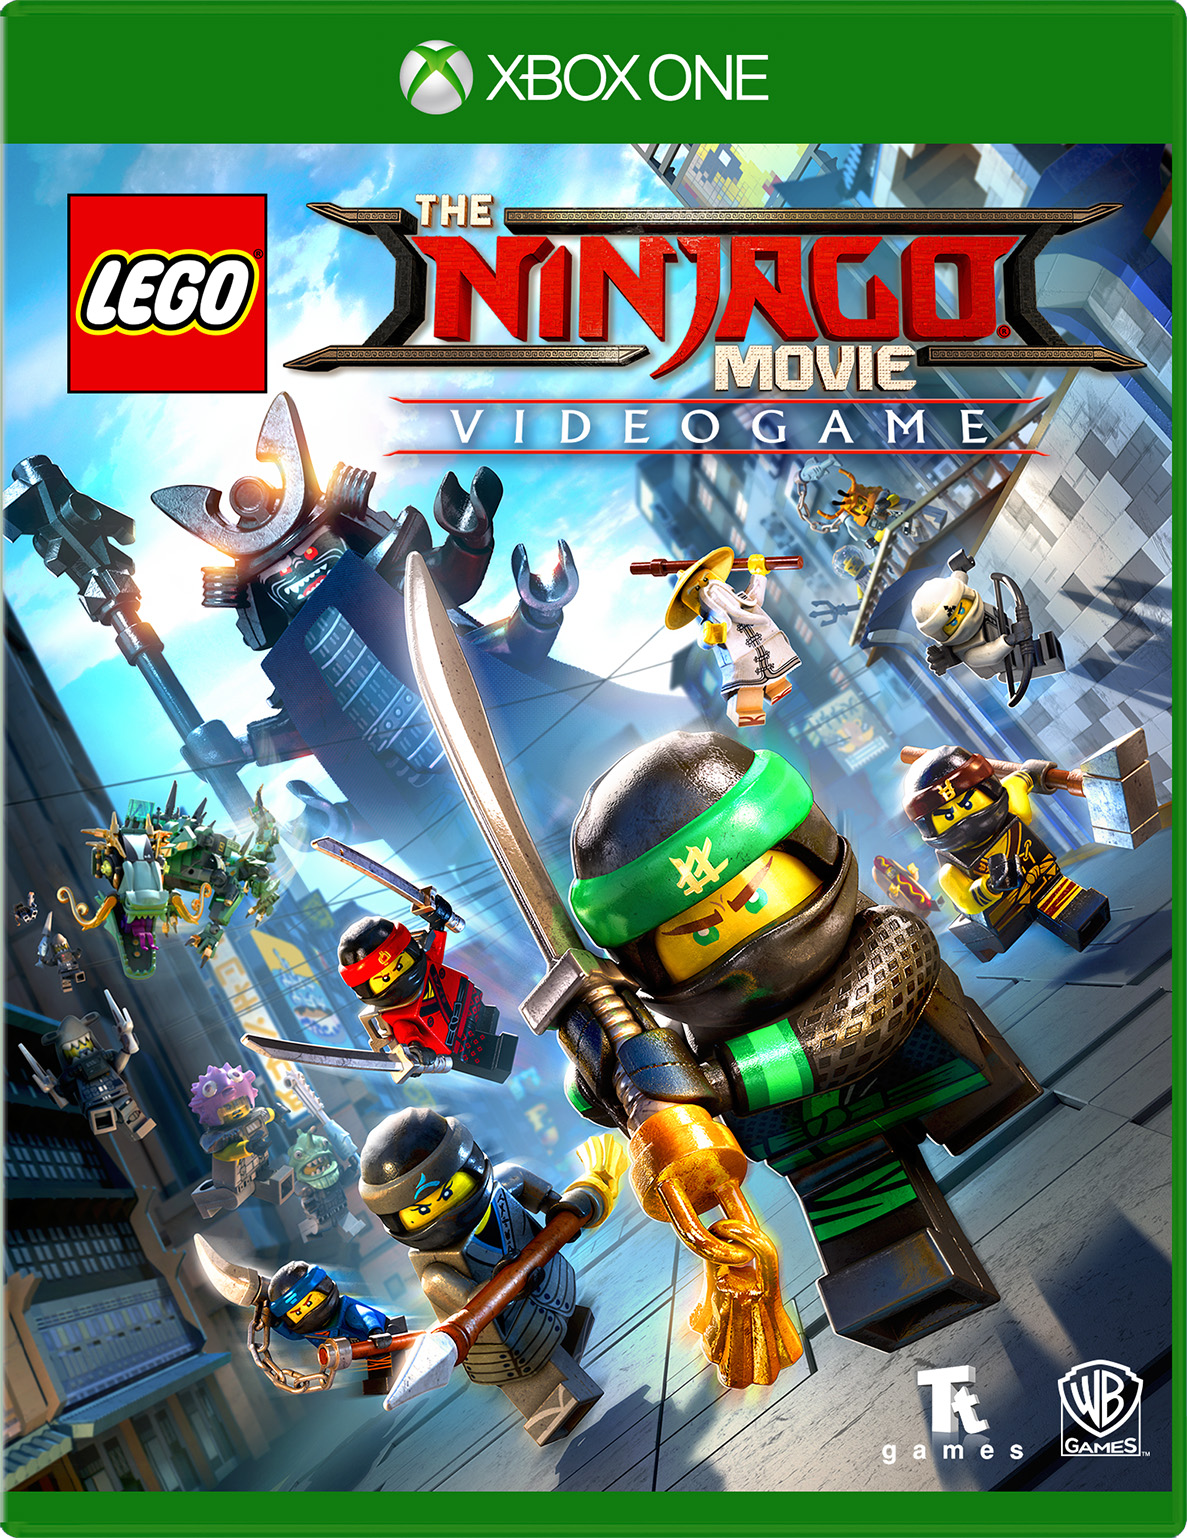 Buy LEGO Ninjago Movie Video Game for Xbox One - Microsoft Store